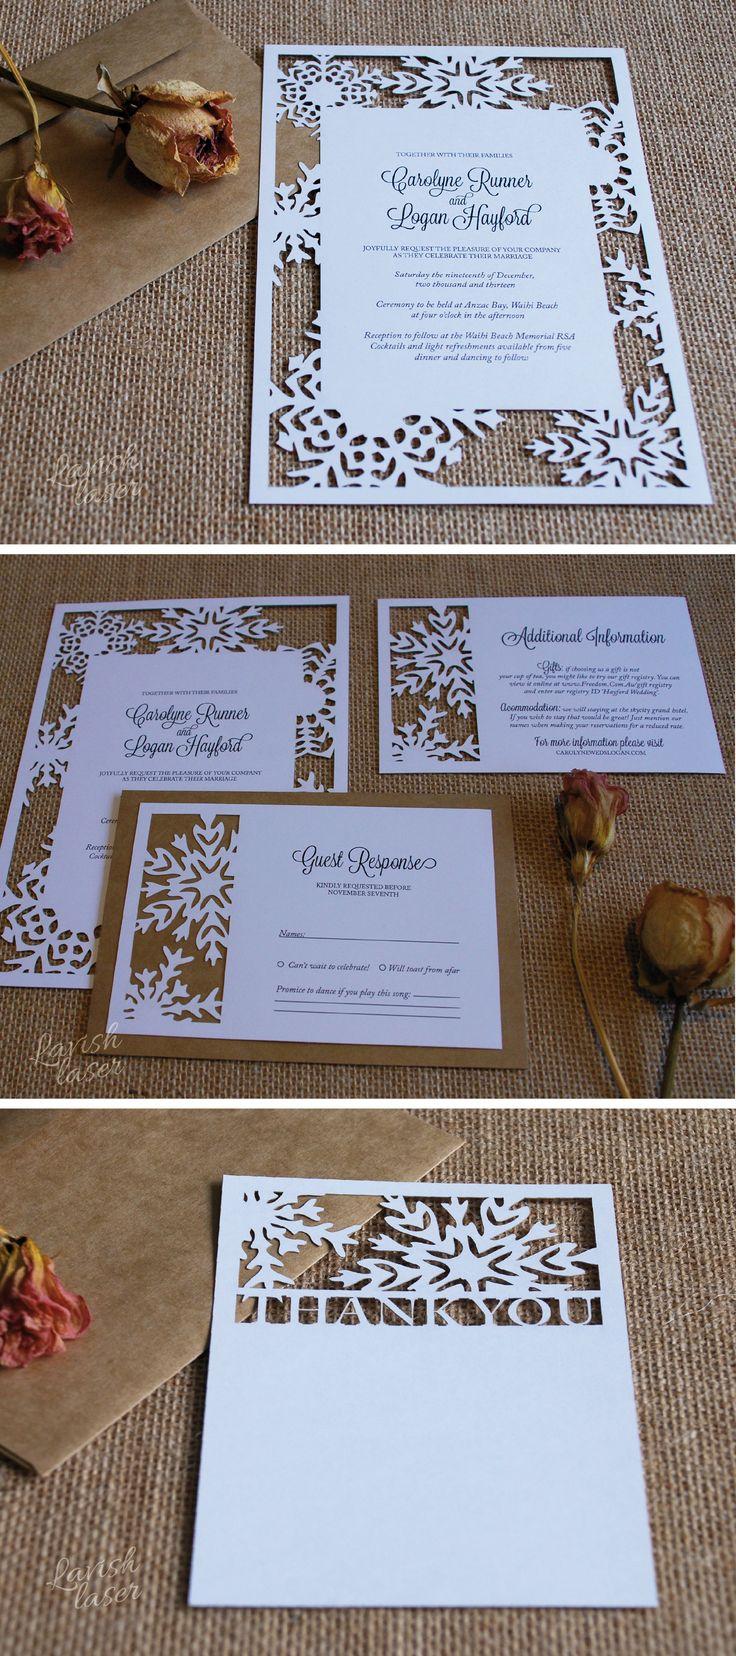 Snowflake Invitation Suite by NZ Studio Lavish Laser Design. https://www.etsy.com/nz/listing/199028591/snowflake-laser-cut-wedding-invitation?ref=shop_home_active_17